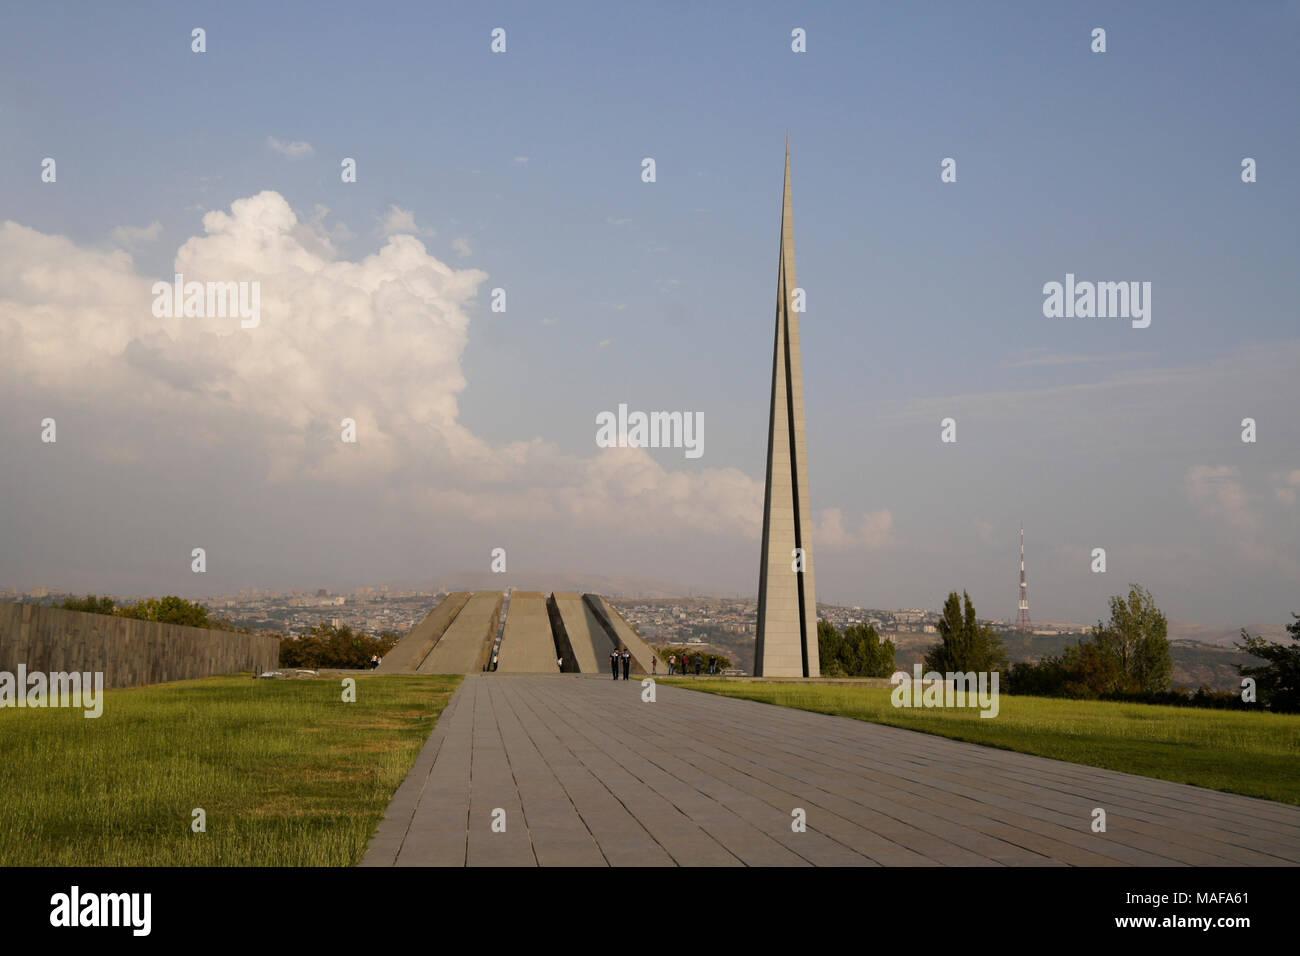 Armenian Genocide Memorial on Tsiternakaberd Hill (Fortress of Swallows), Yereven, Armenia - Stock Image